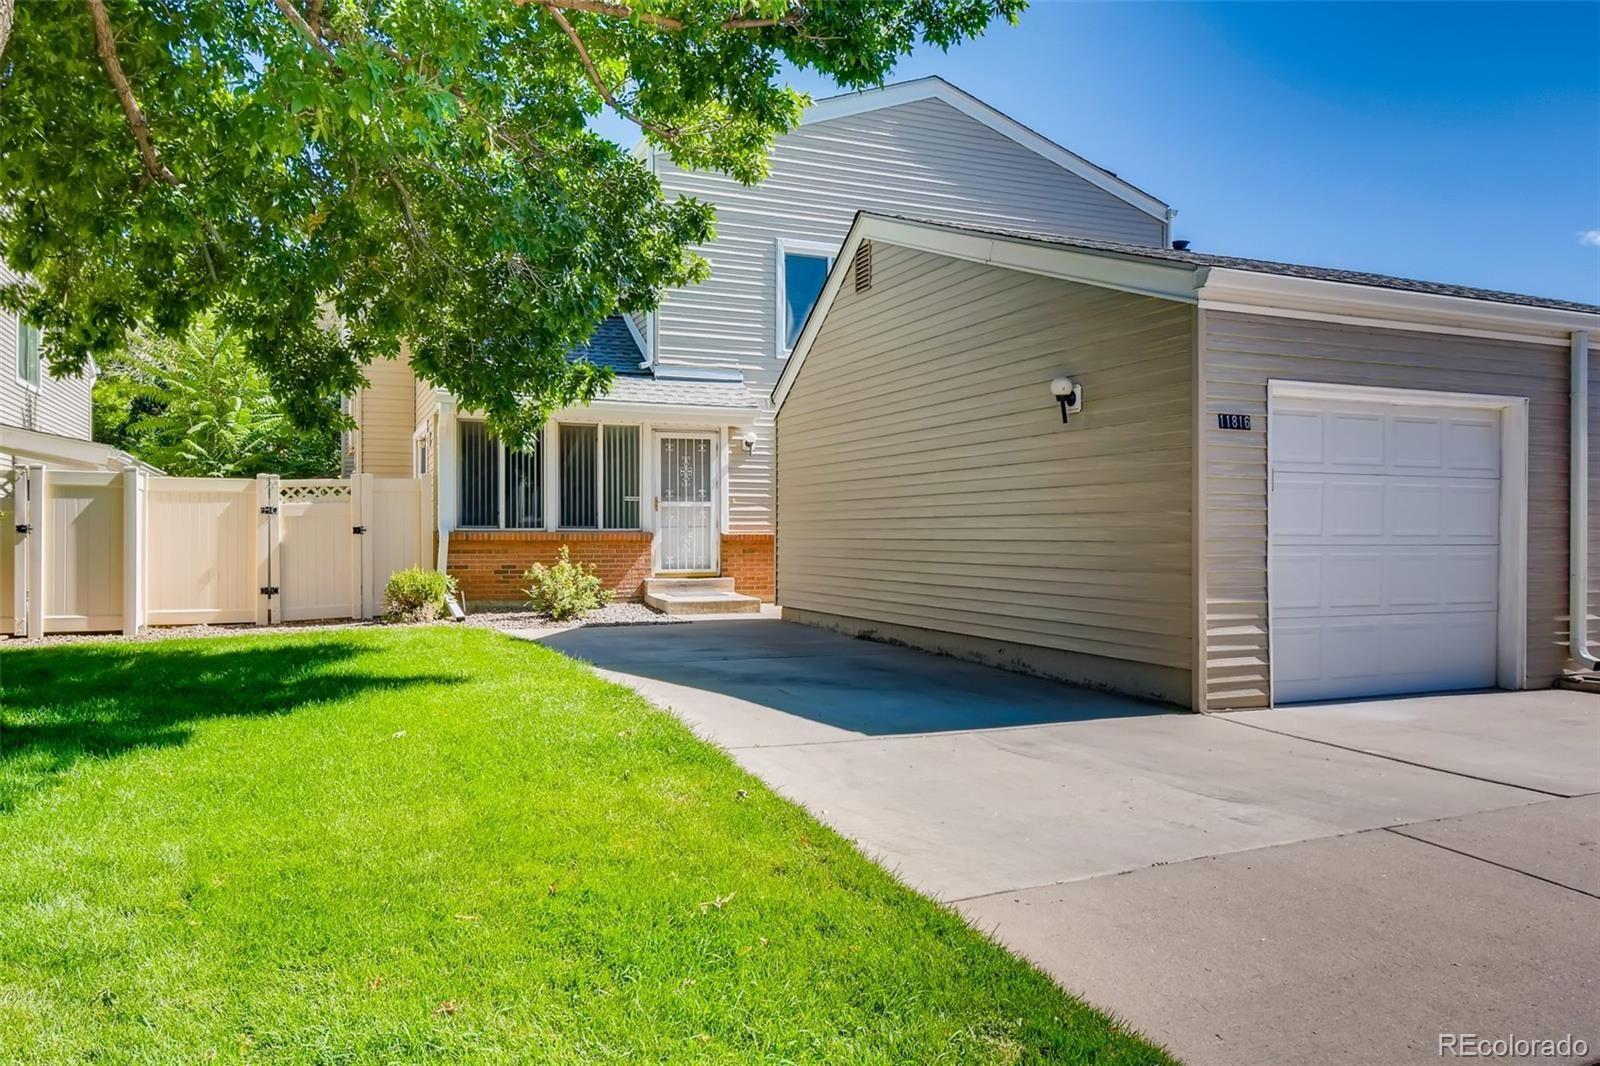 Photo of 11816 Garfield Street, Thornton, CO 80233 (MLS # 5171800)